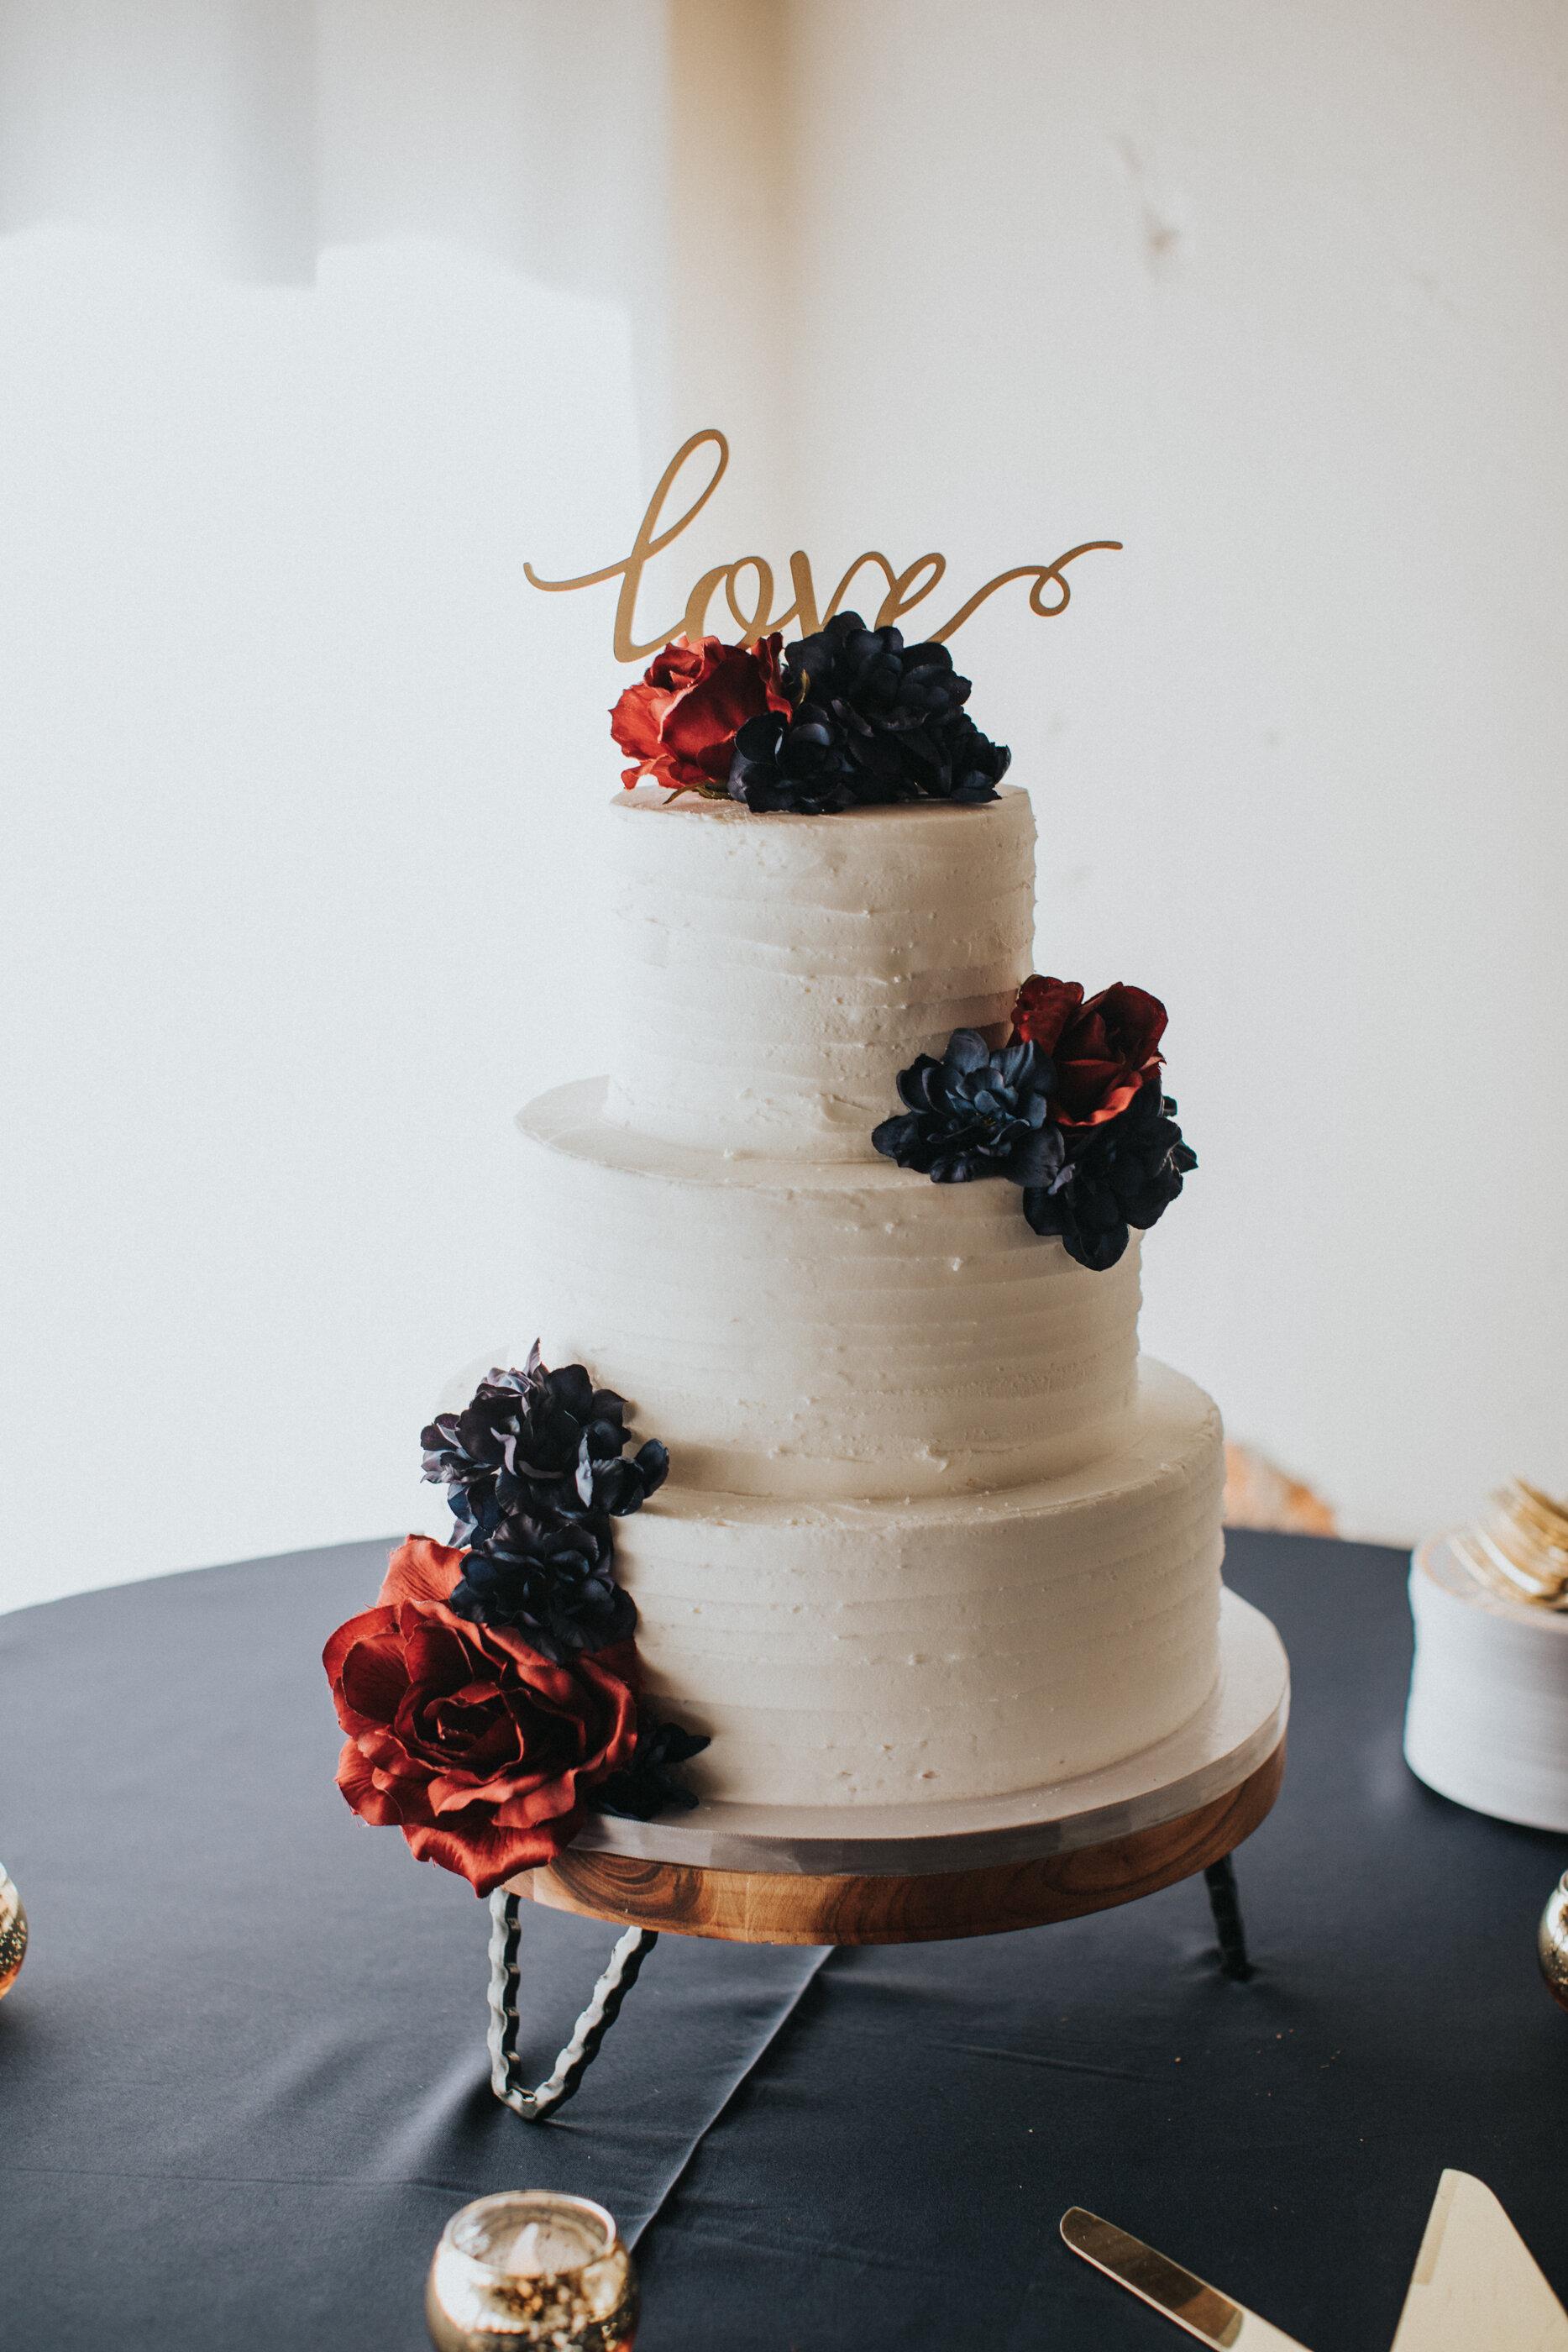 Buttercream Bakehouse Wedding Cake at Artisan Traders Wedding  Greenville SC